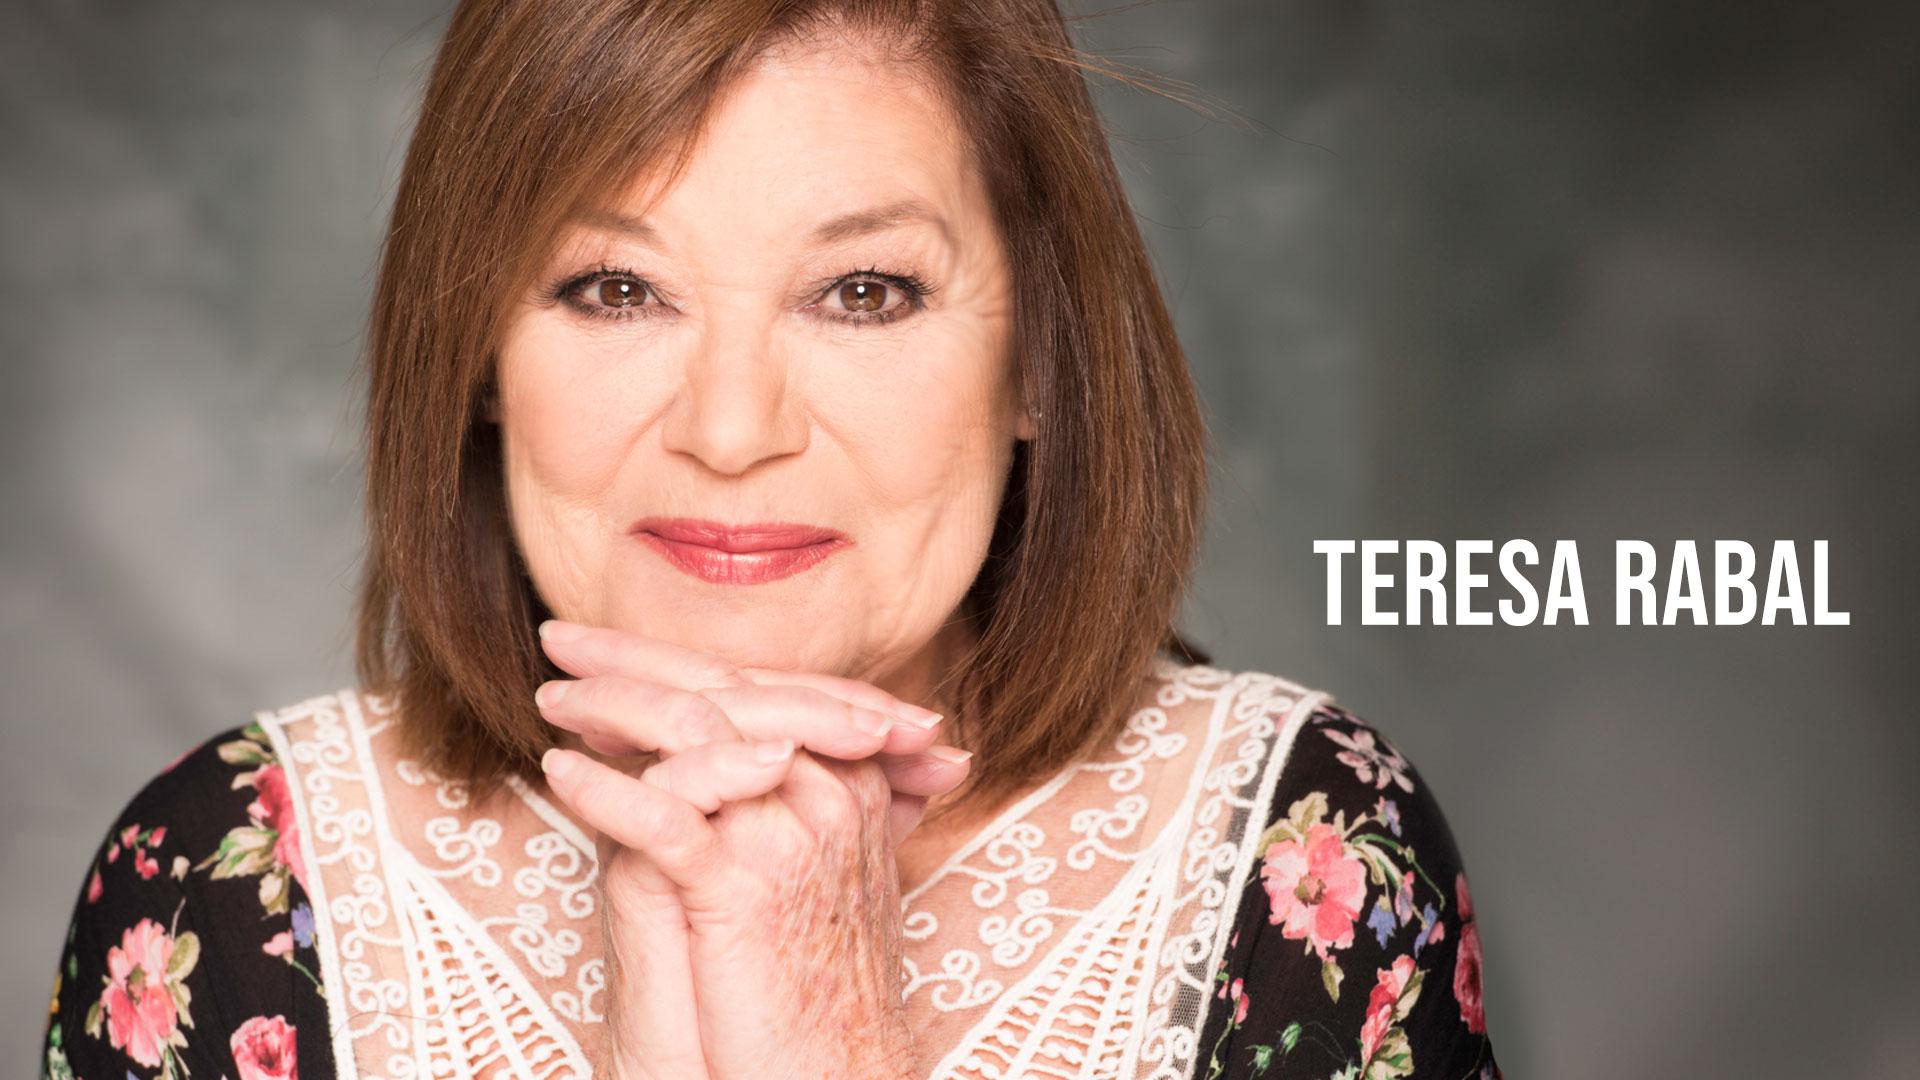 Teresa Rabal - Videobook Actriz